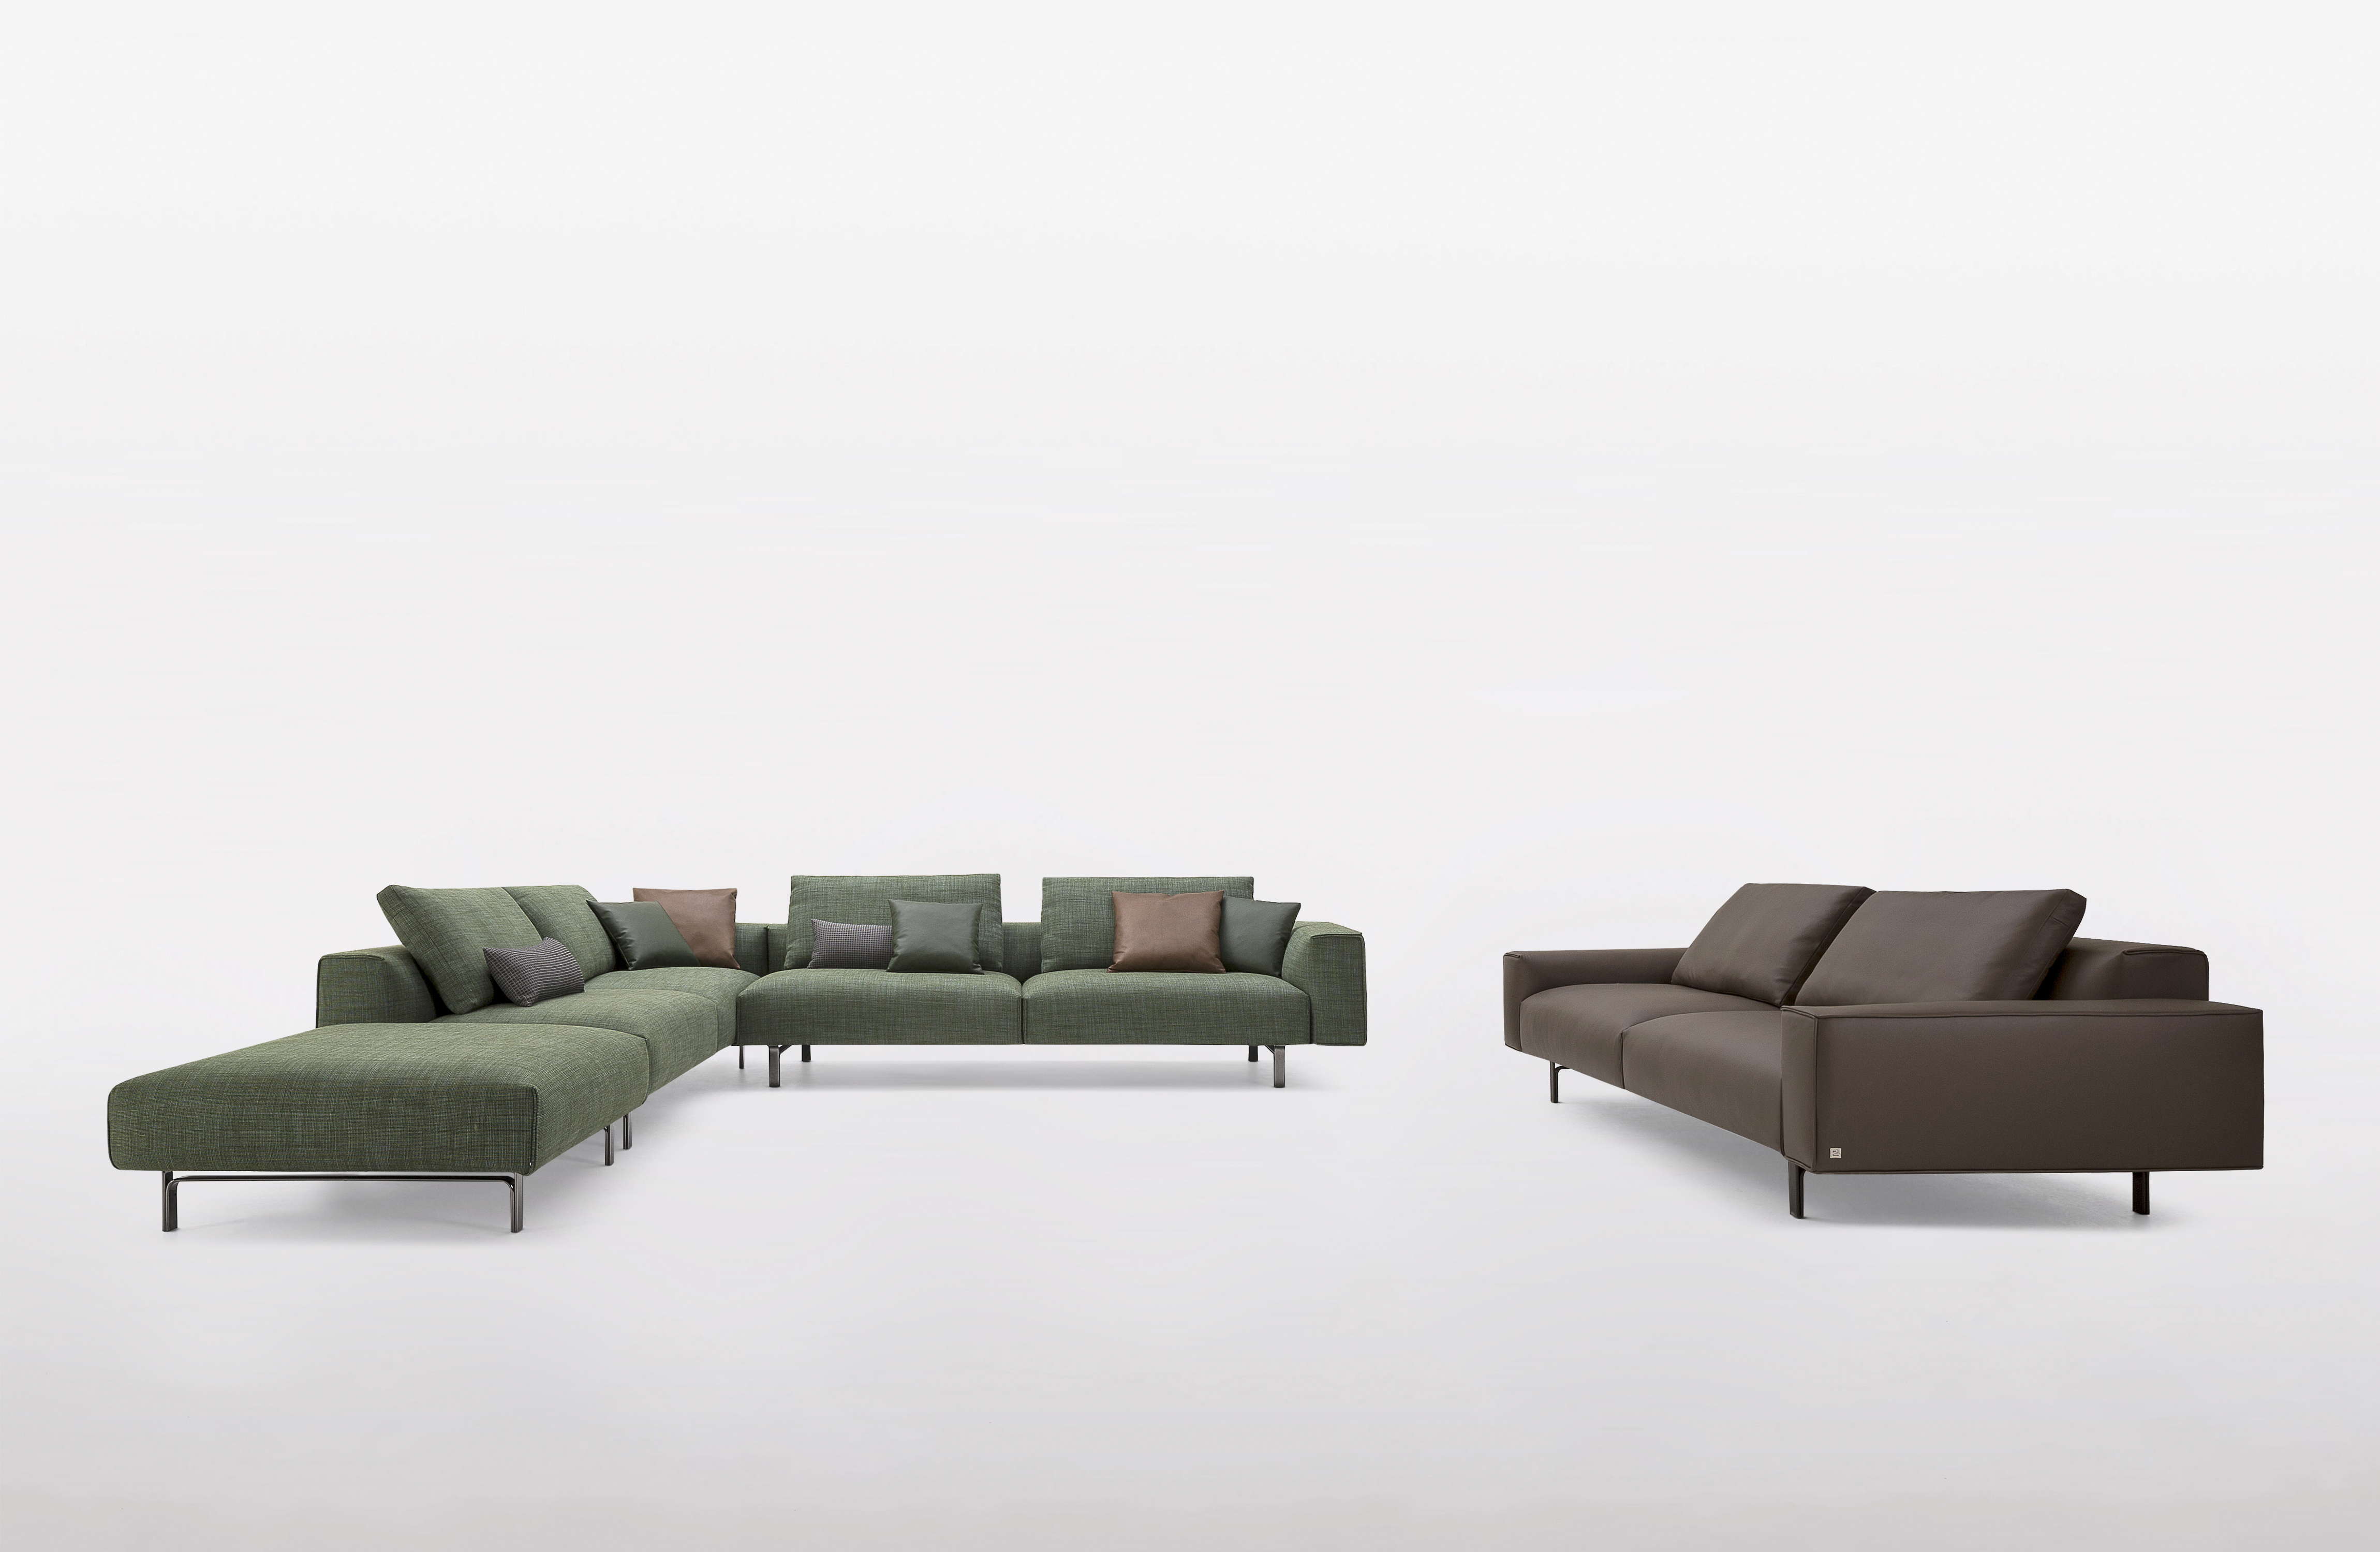 busnelli-todd-modular sofa-04